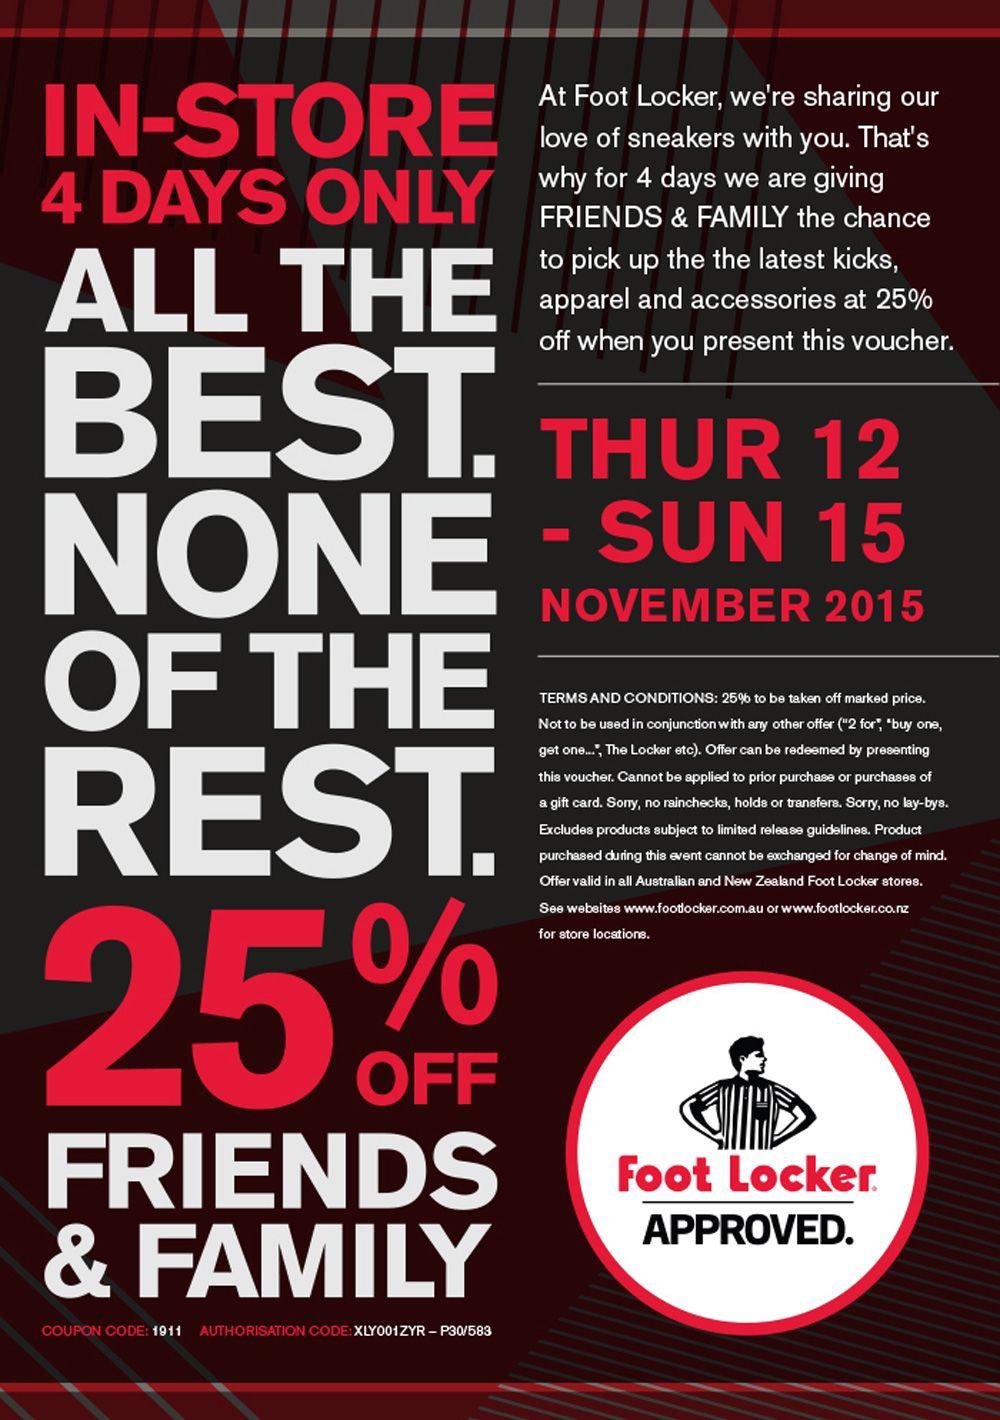 Pinsleekdeals.co.nz On Deals | Lockers, Foot Locker, Coupons - Free Printable Footlocker Coupons